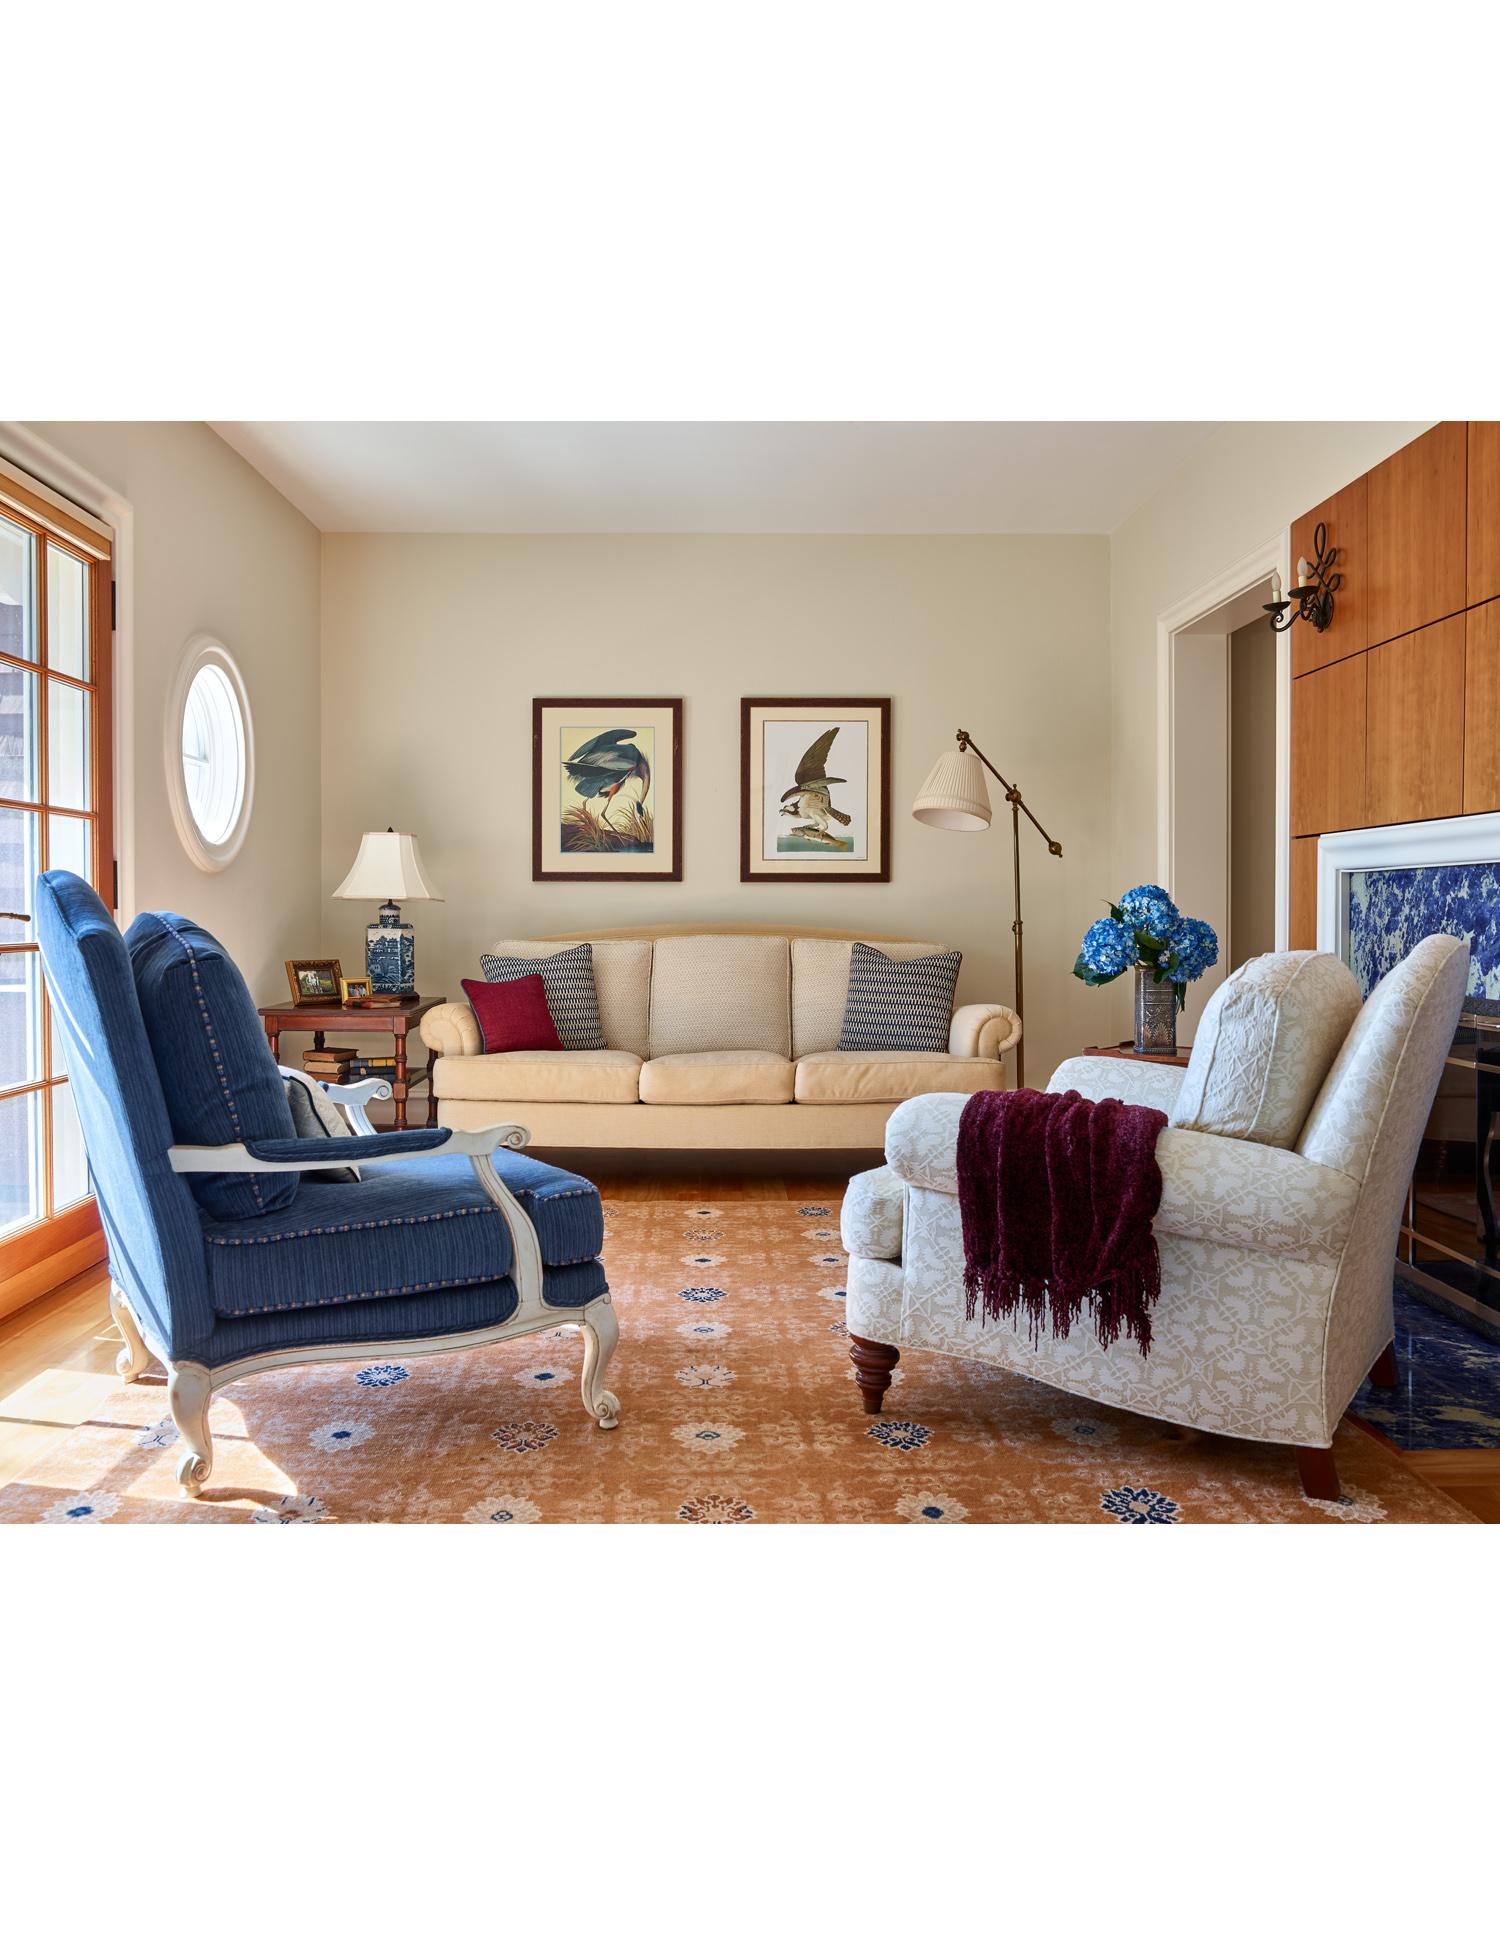 Lexington 9 Cream and Blue Sofa.jpg